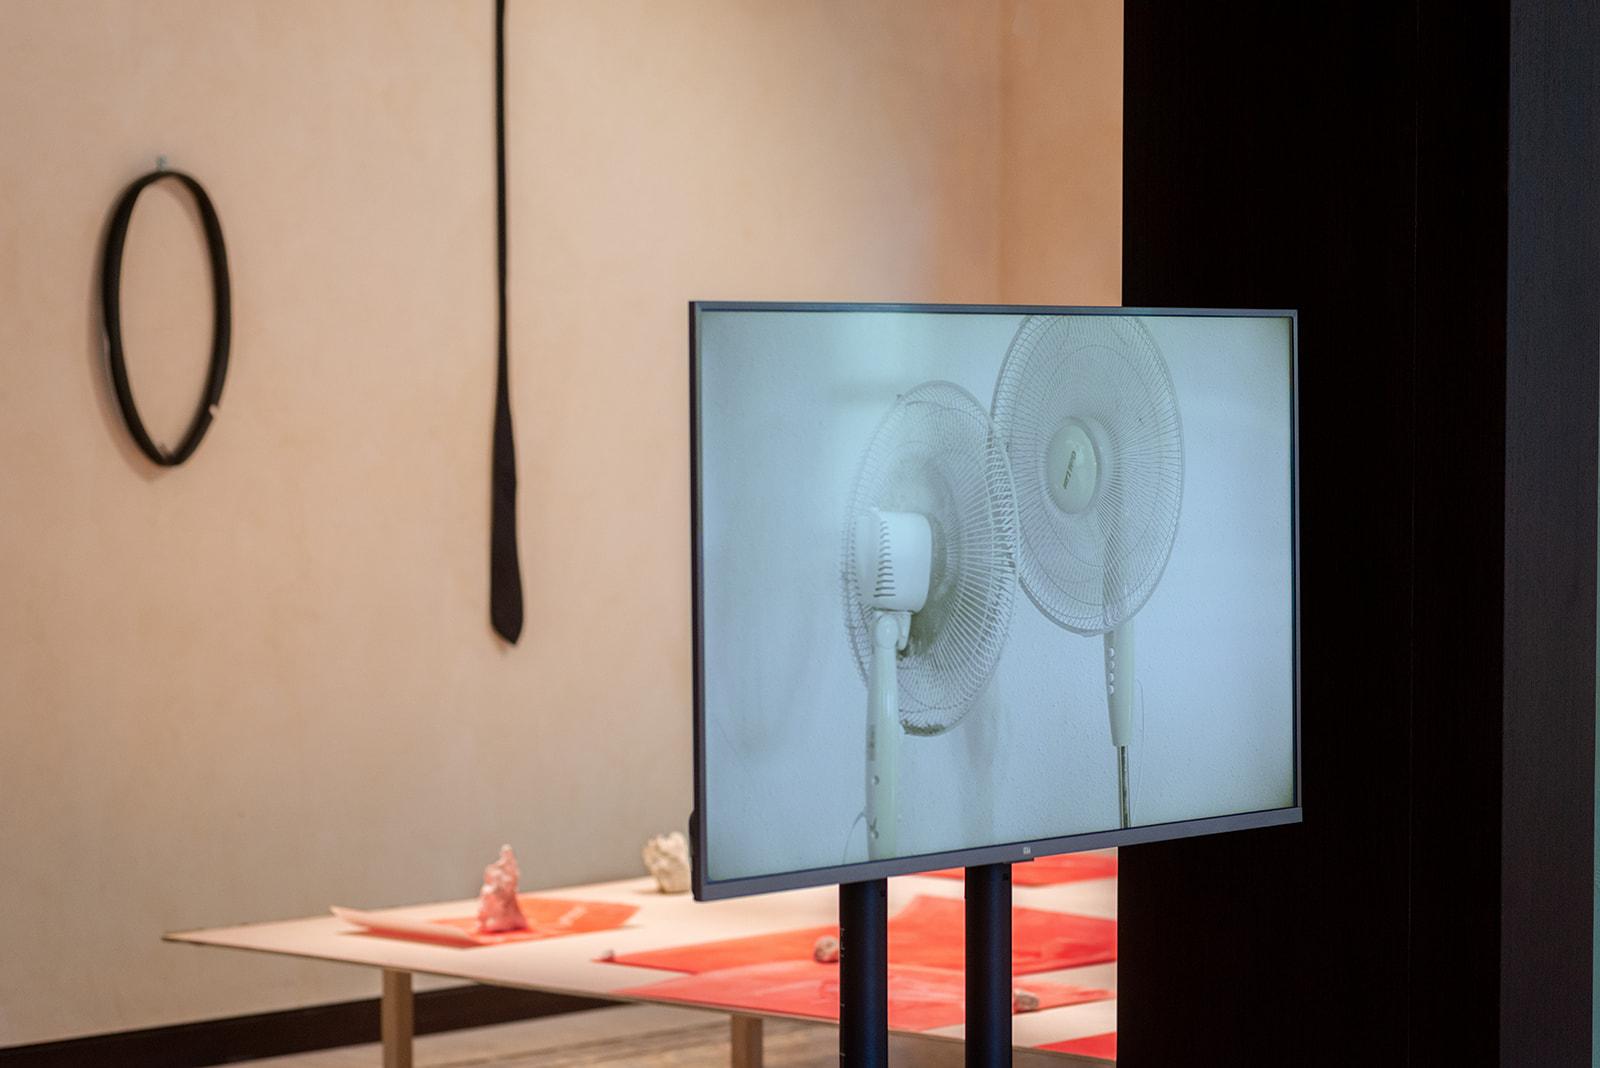 Kobi Amiel, CRAZY, 2020, video<br /> Kobi Amiel, Untitled, 2021, ready-made<br /> Photography: Neta Cones